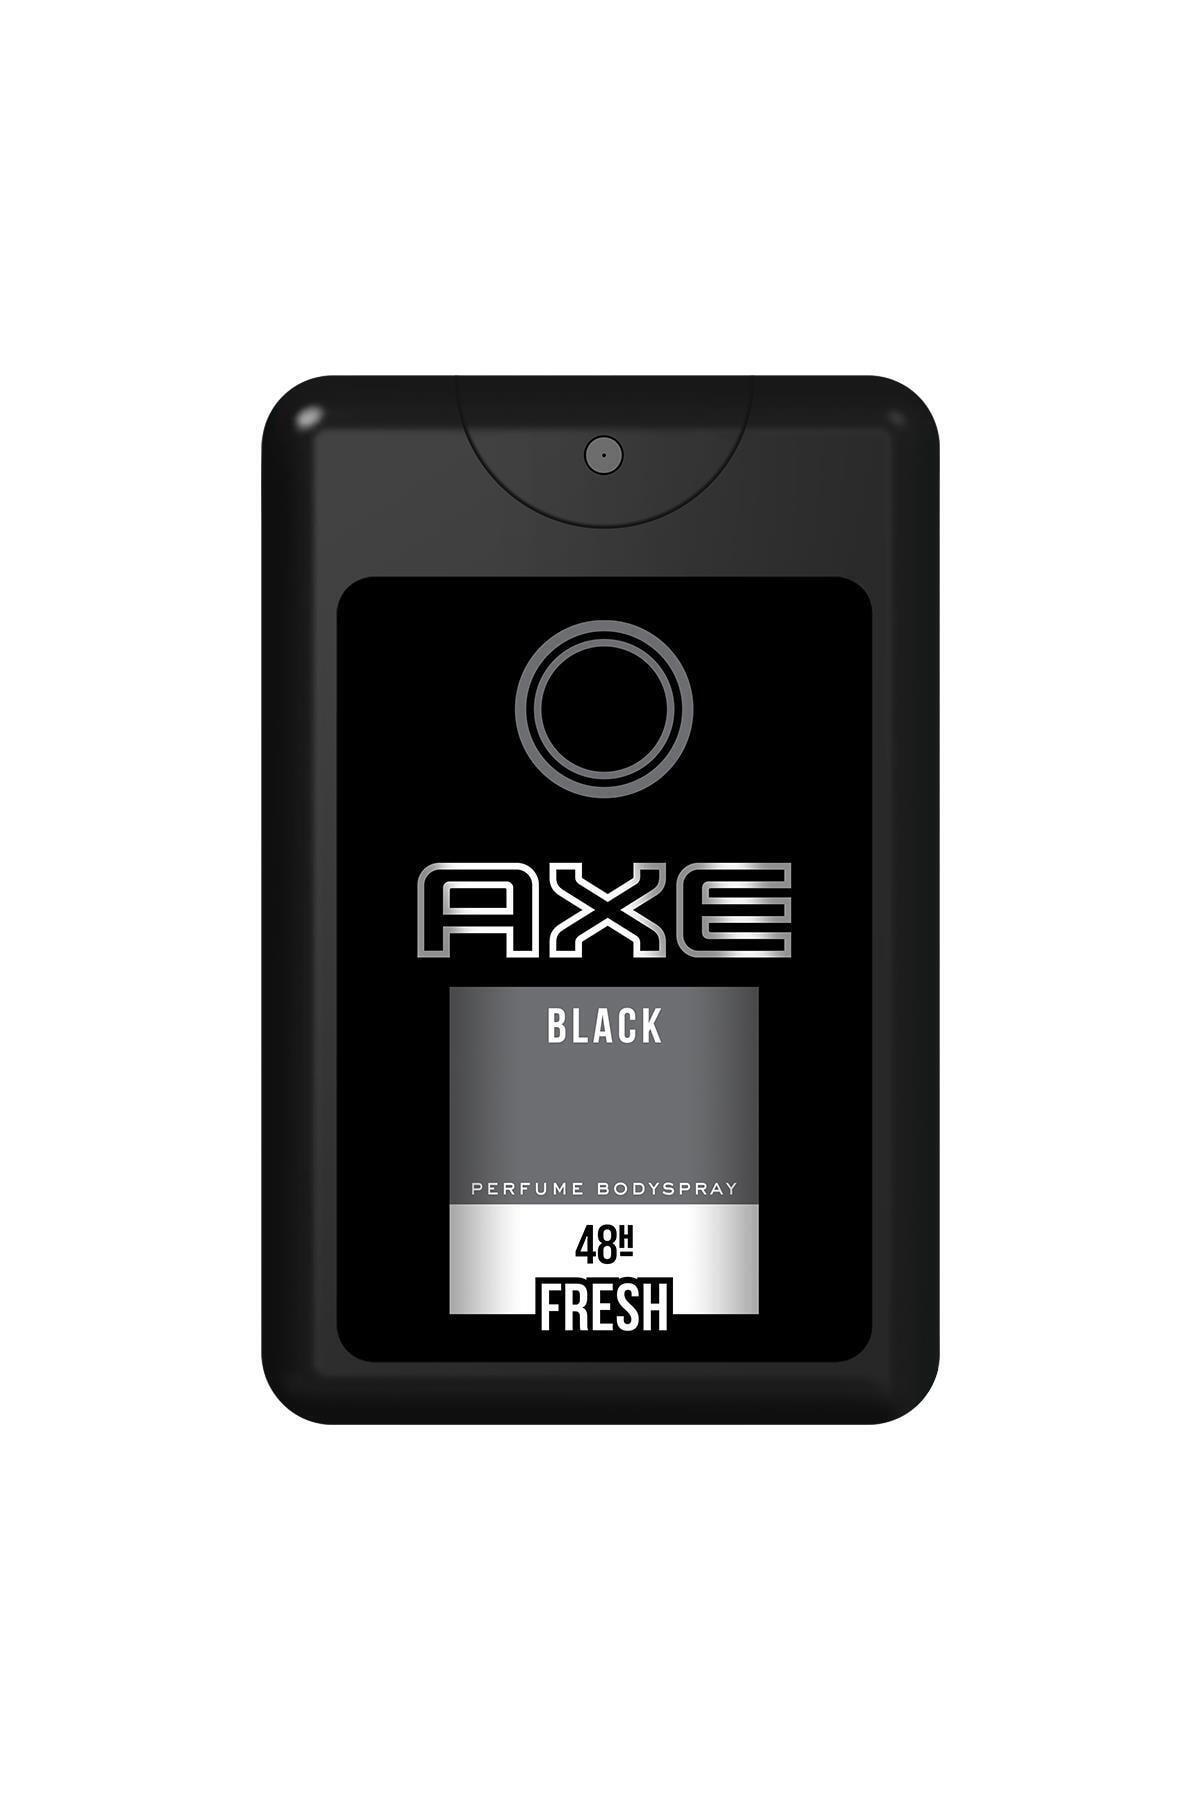 Axe Cep Parfumu Black 17 ml 2